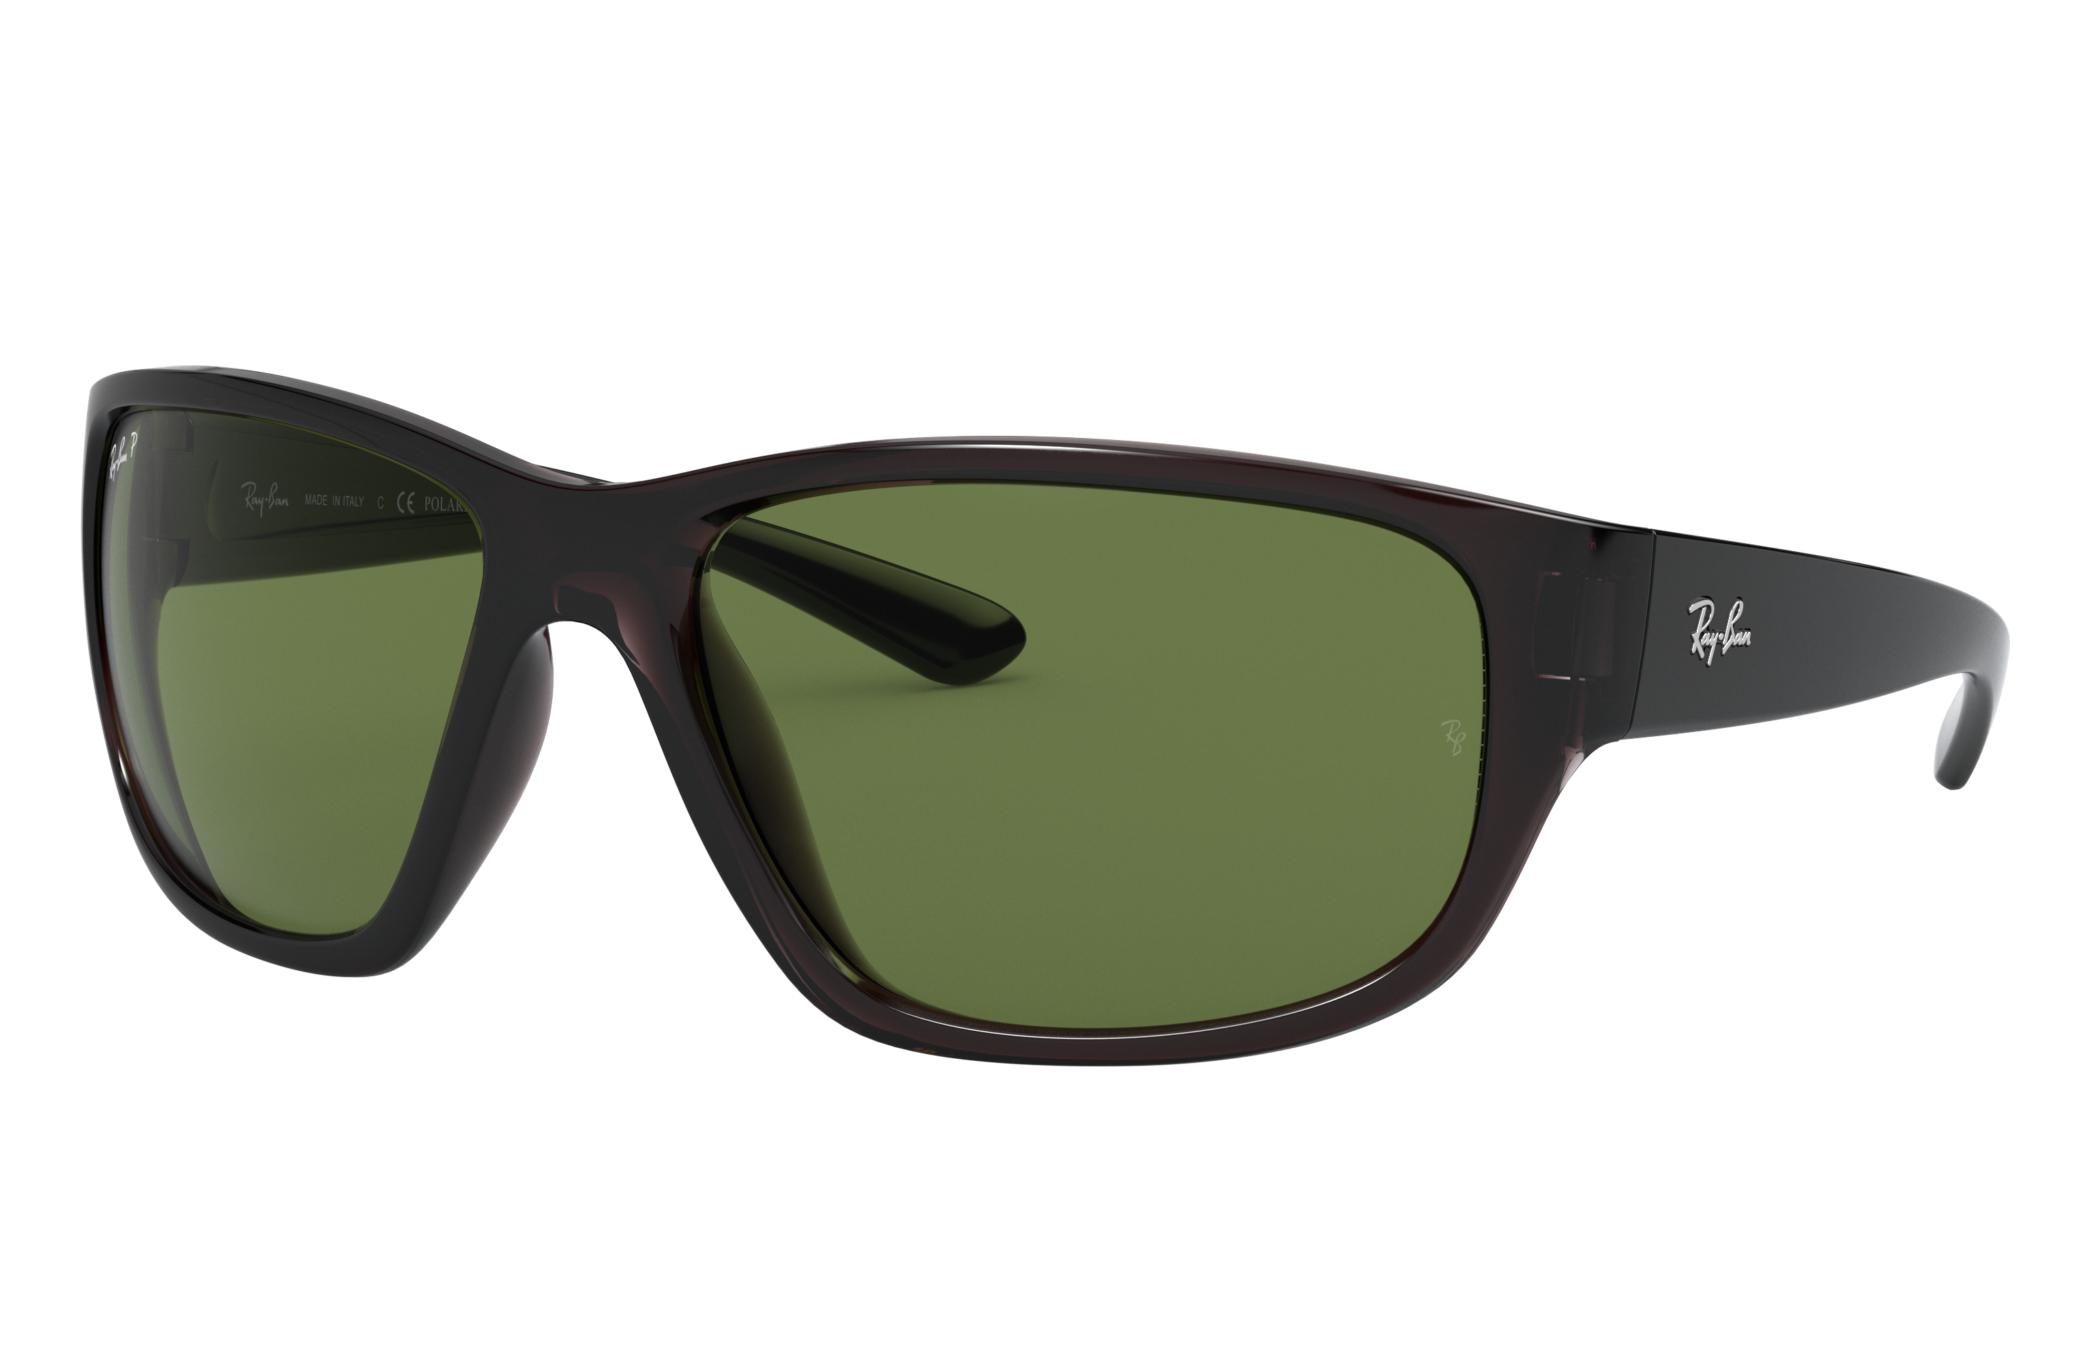 Ray-Ban Rb4300 Transparent Grey, Polarized Green Lenses - RB4300